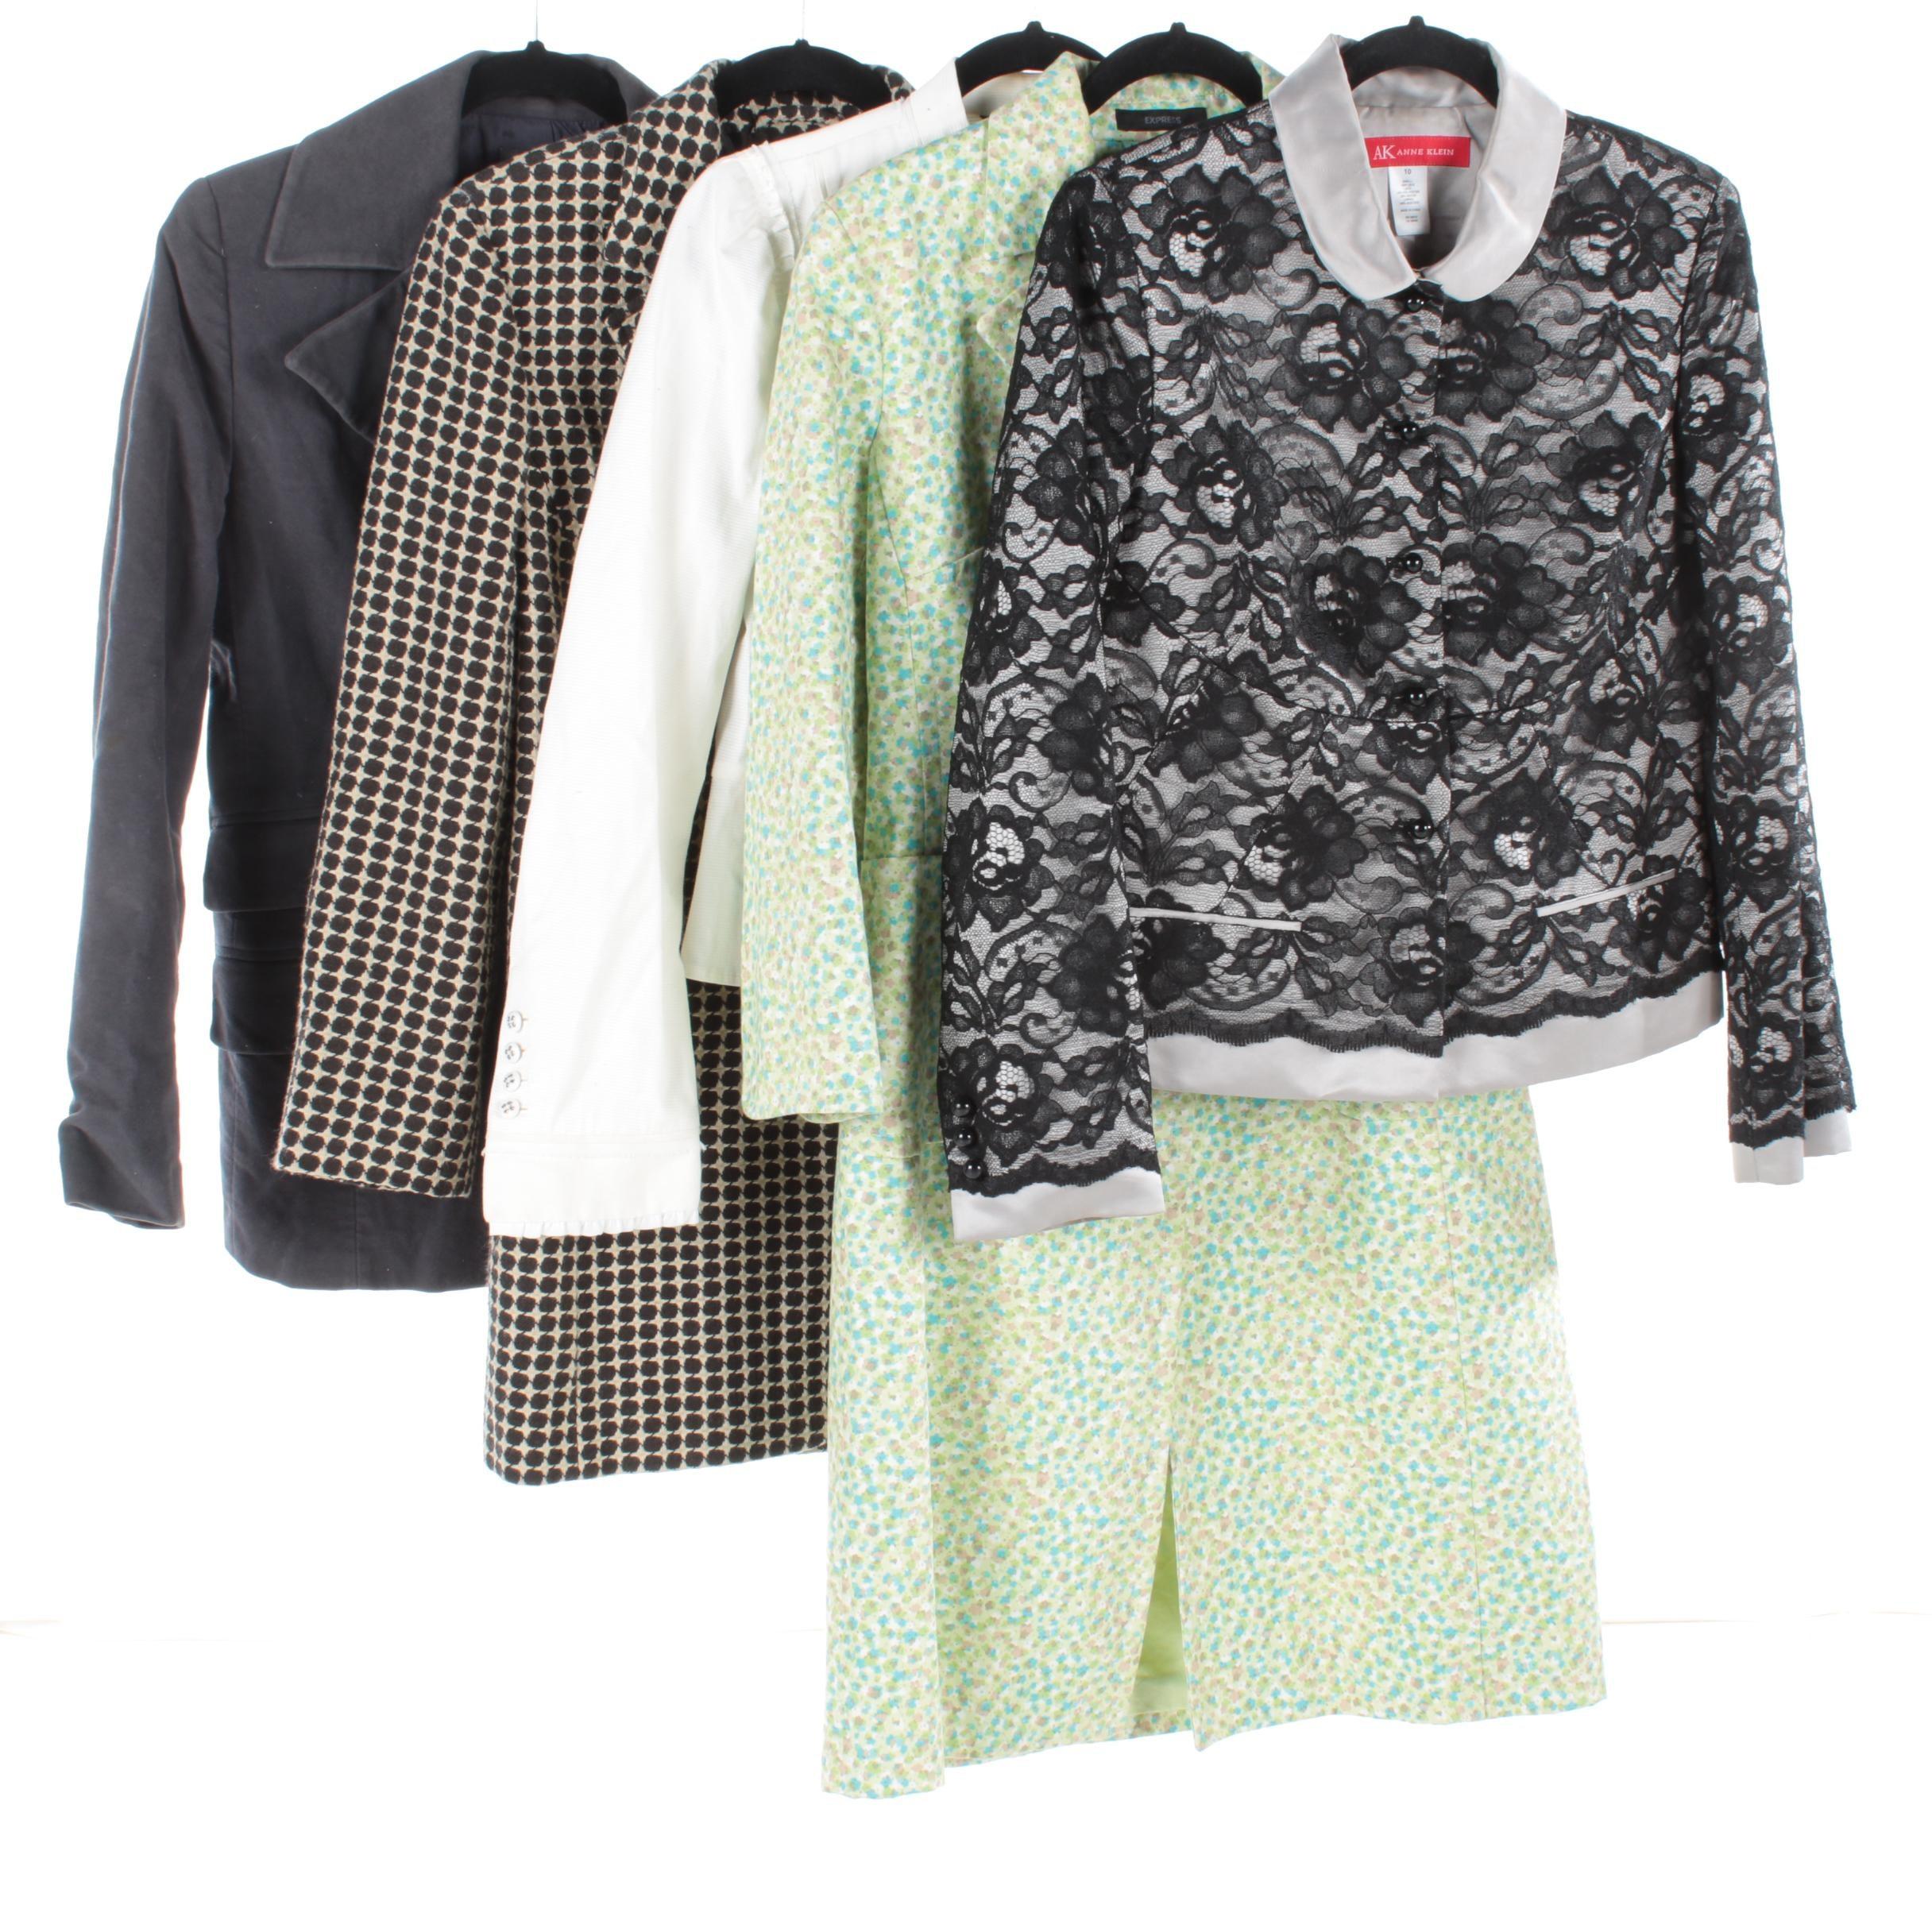 Women's Outerwear, Including Anne Klein